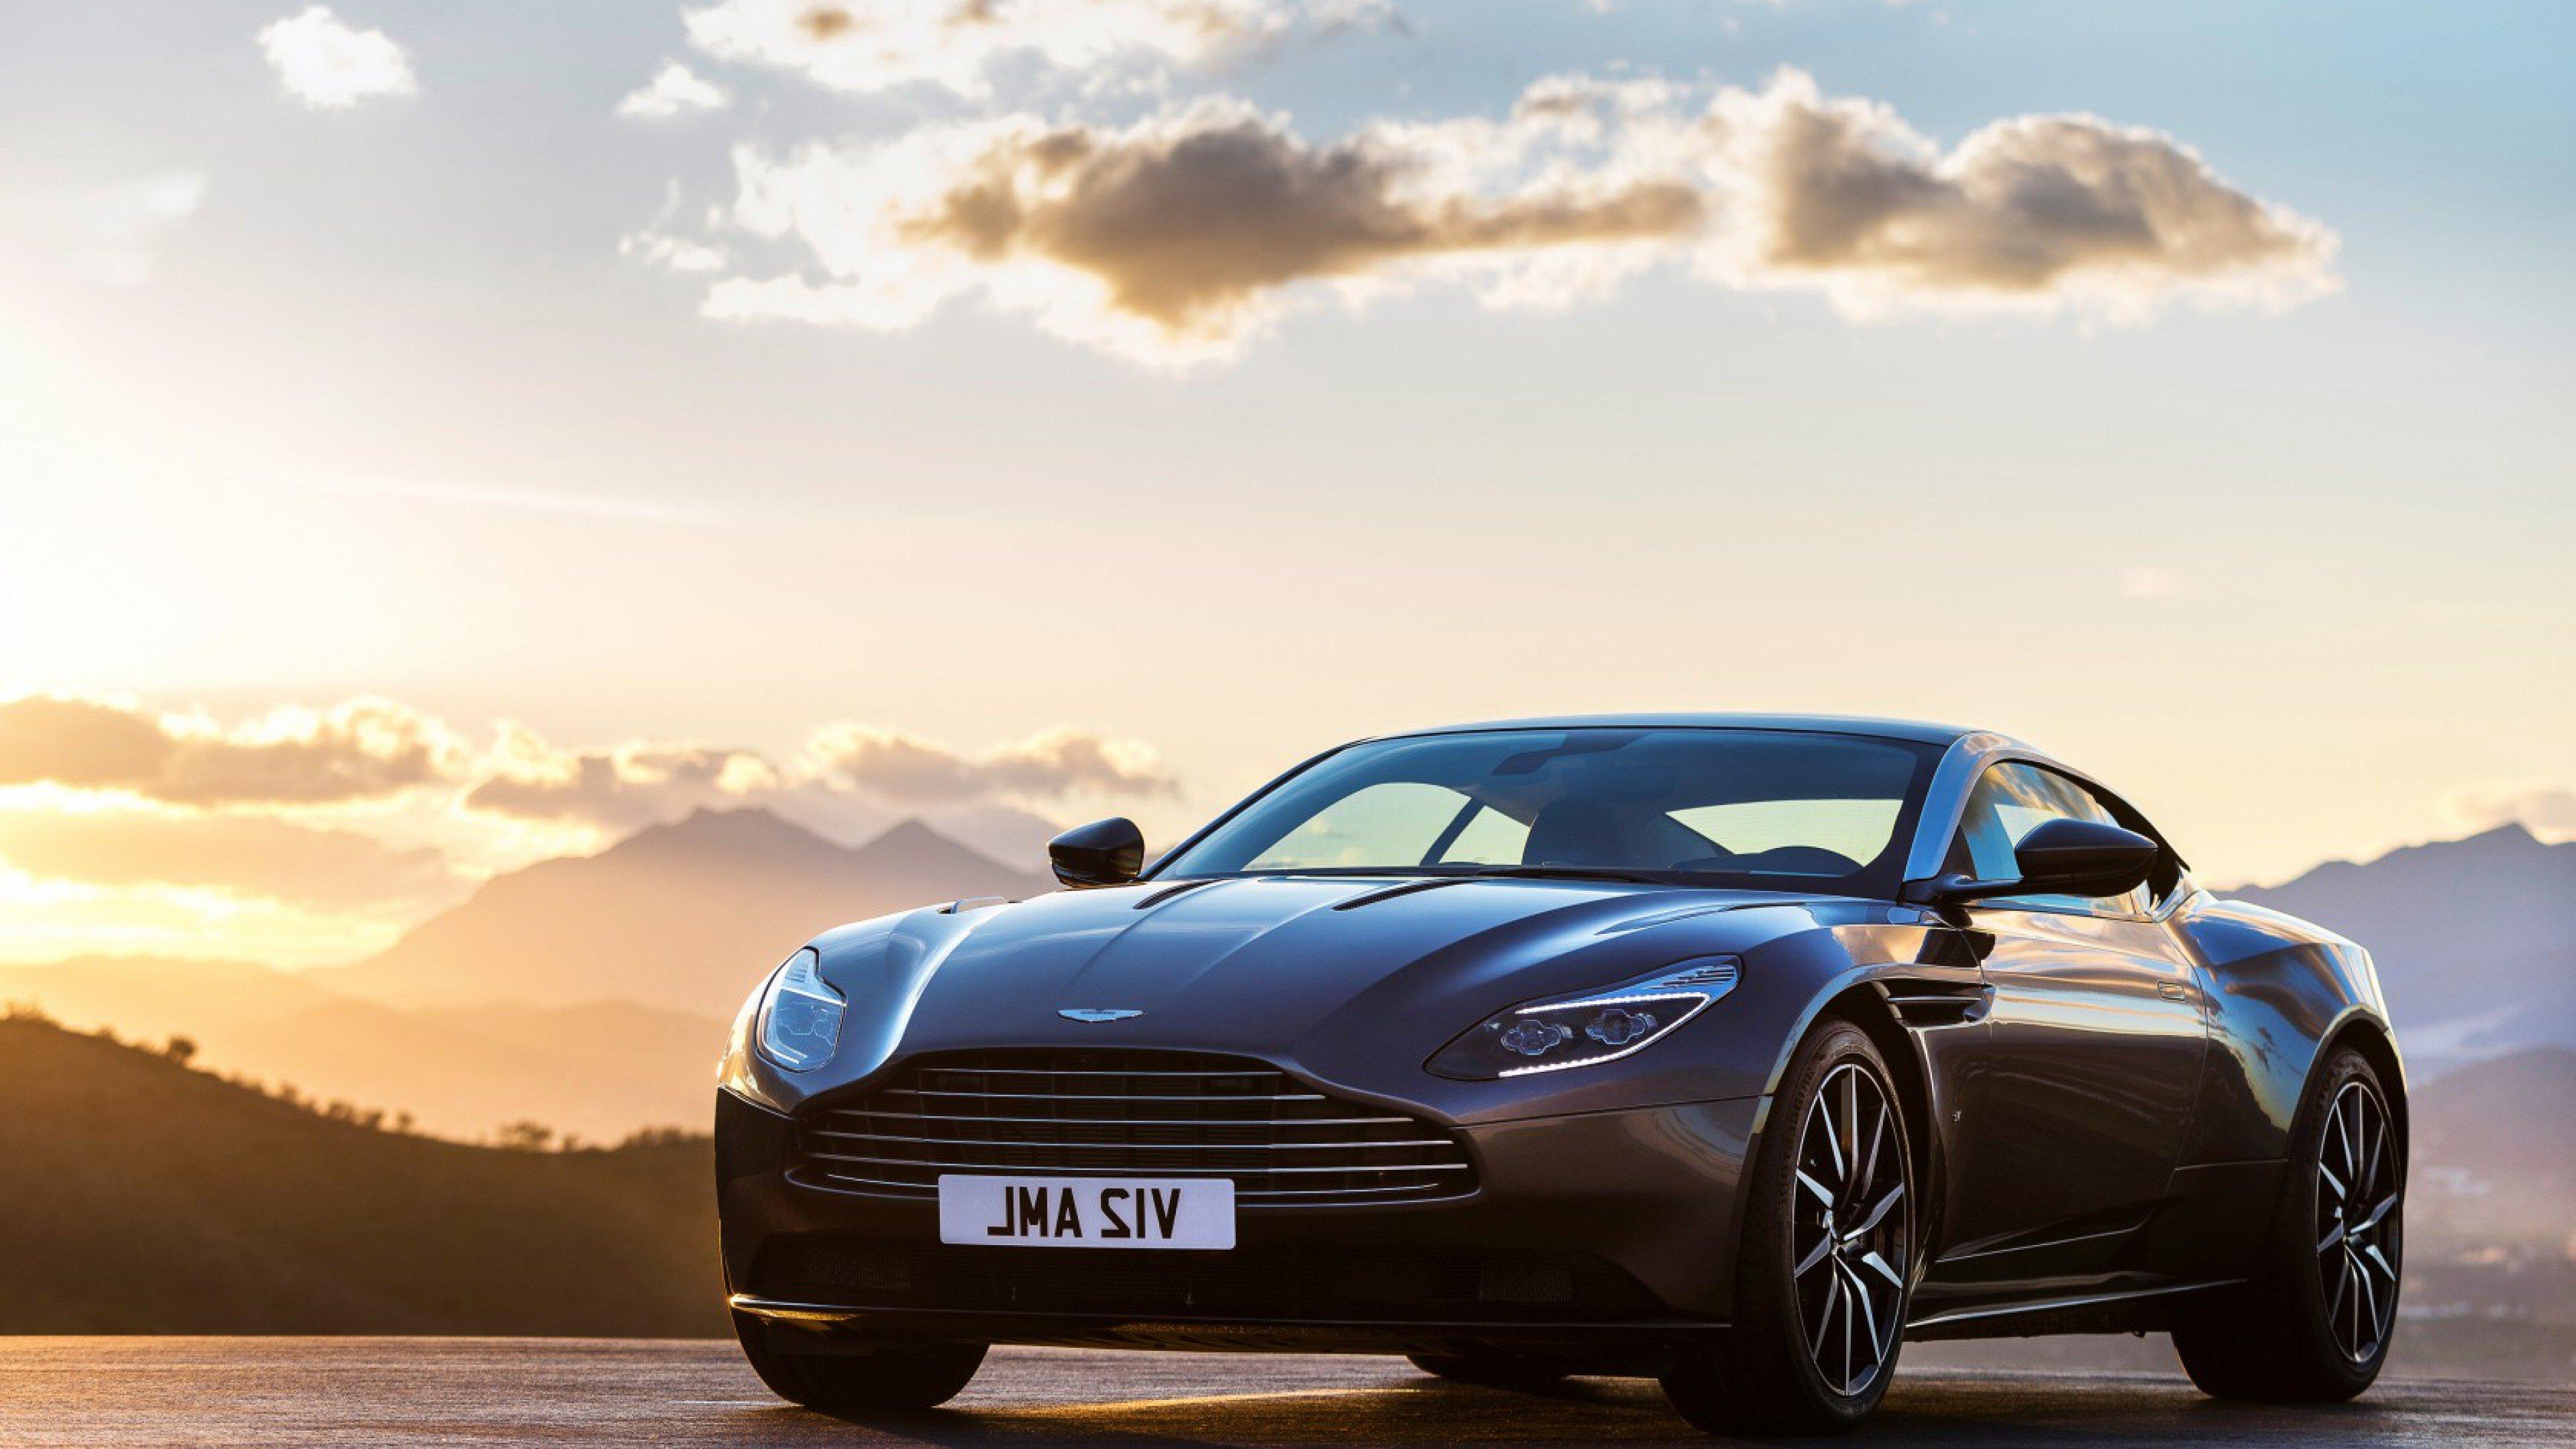 1366x768 Aston Martin Db11 Side View 1366x768 Resolution Hd 4k